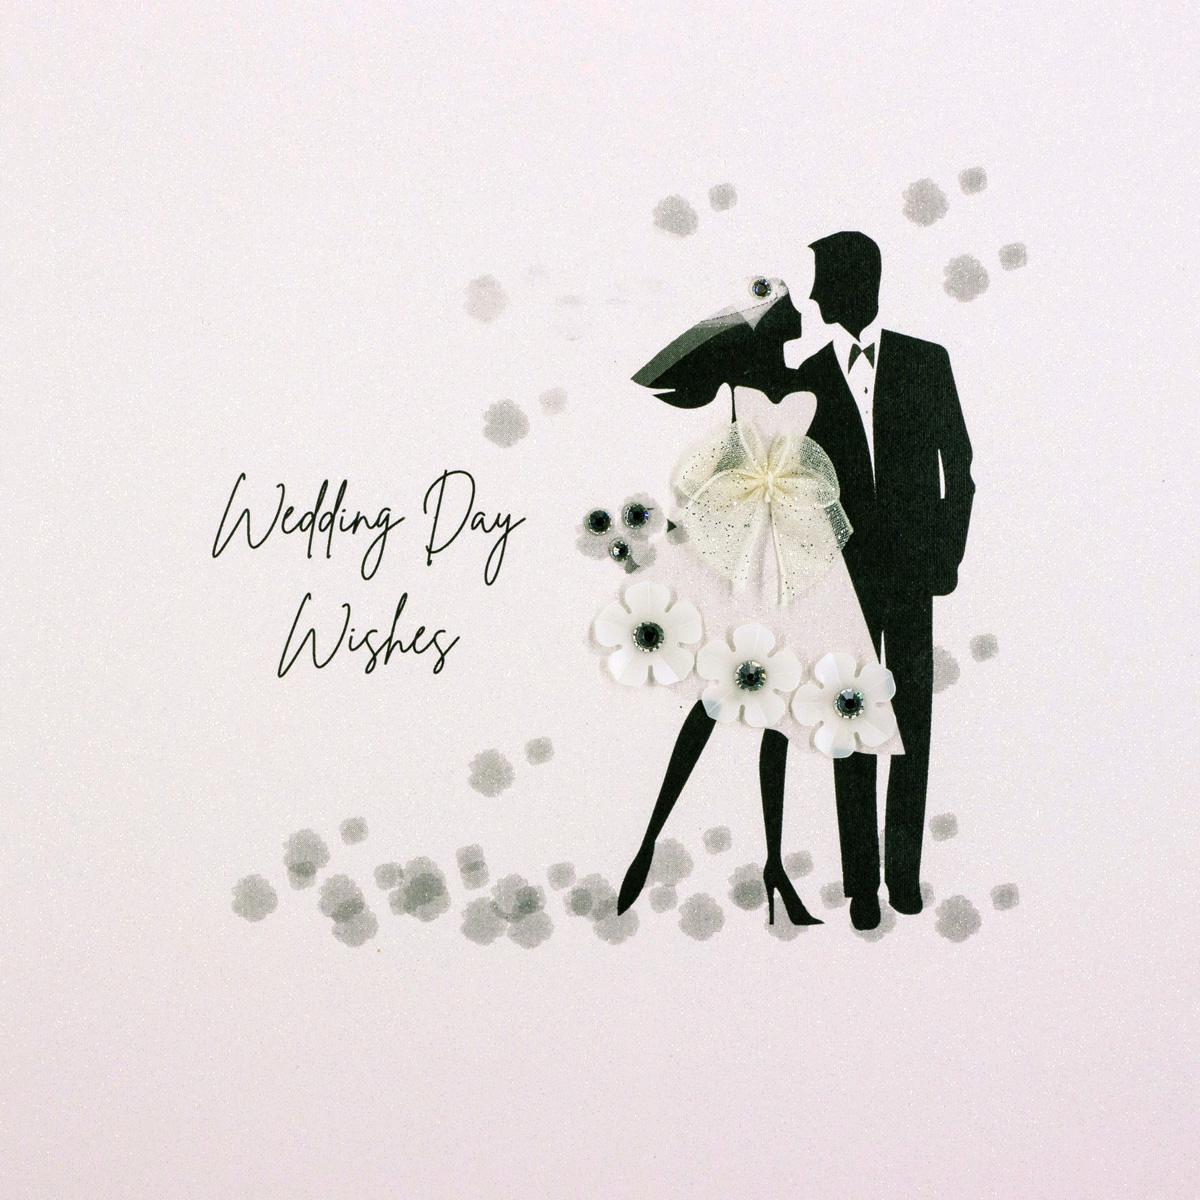 Wedding Day Wishes